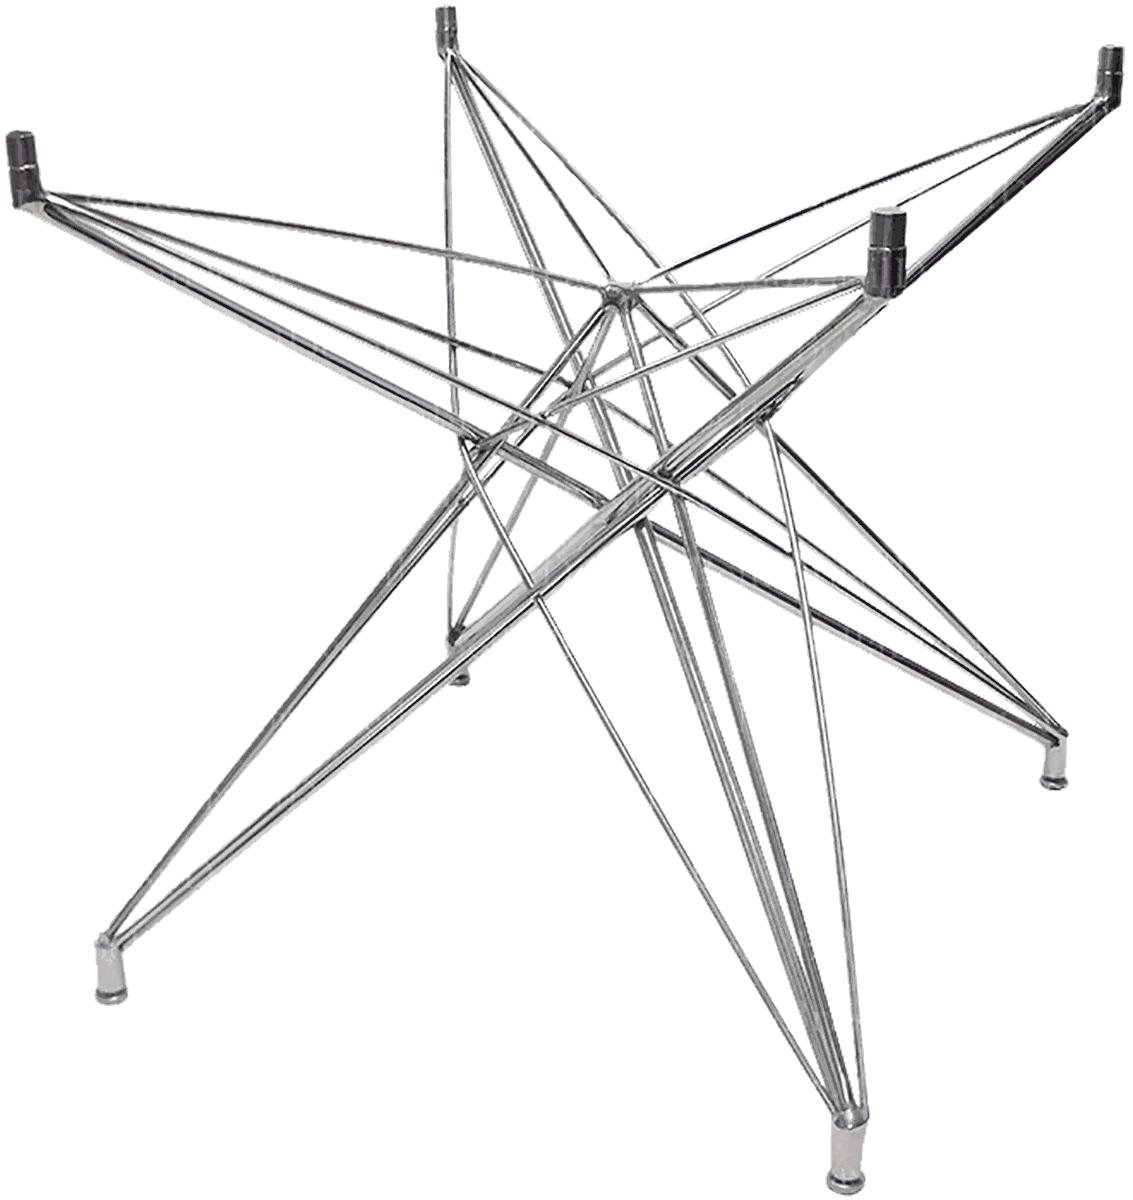 Base de Mesa Estrela Quadrada Pequena Inox